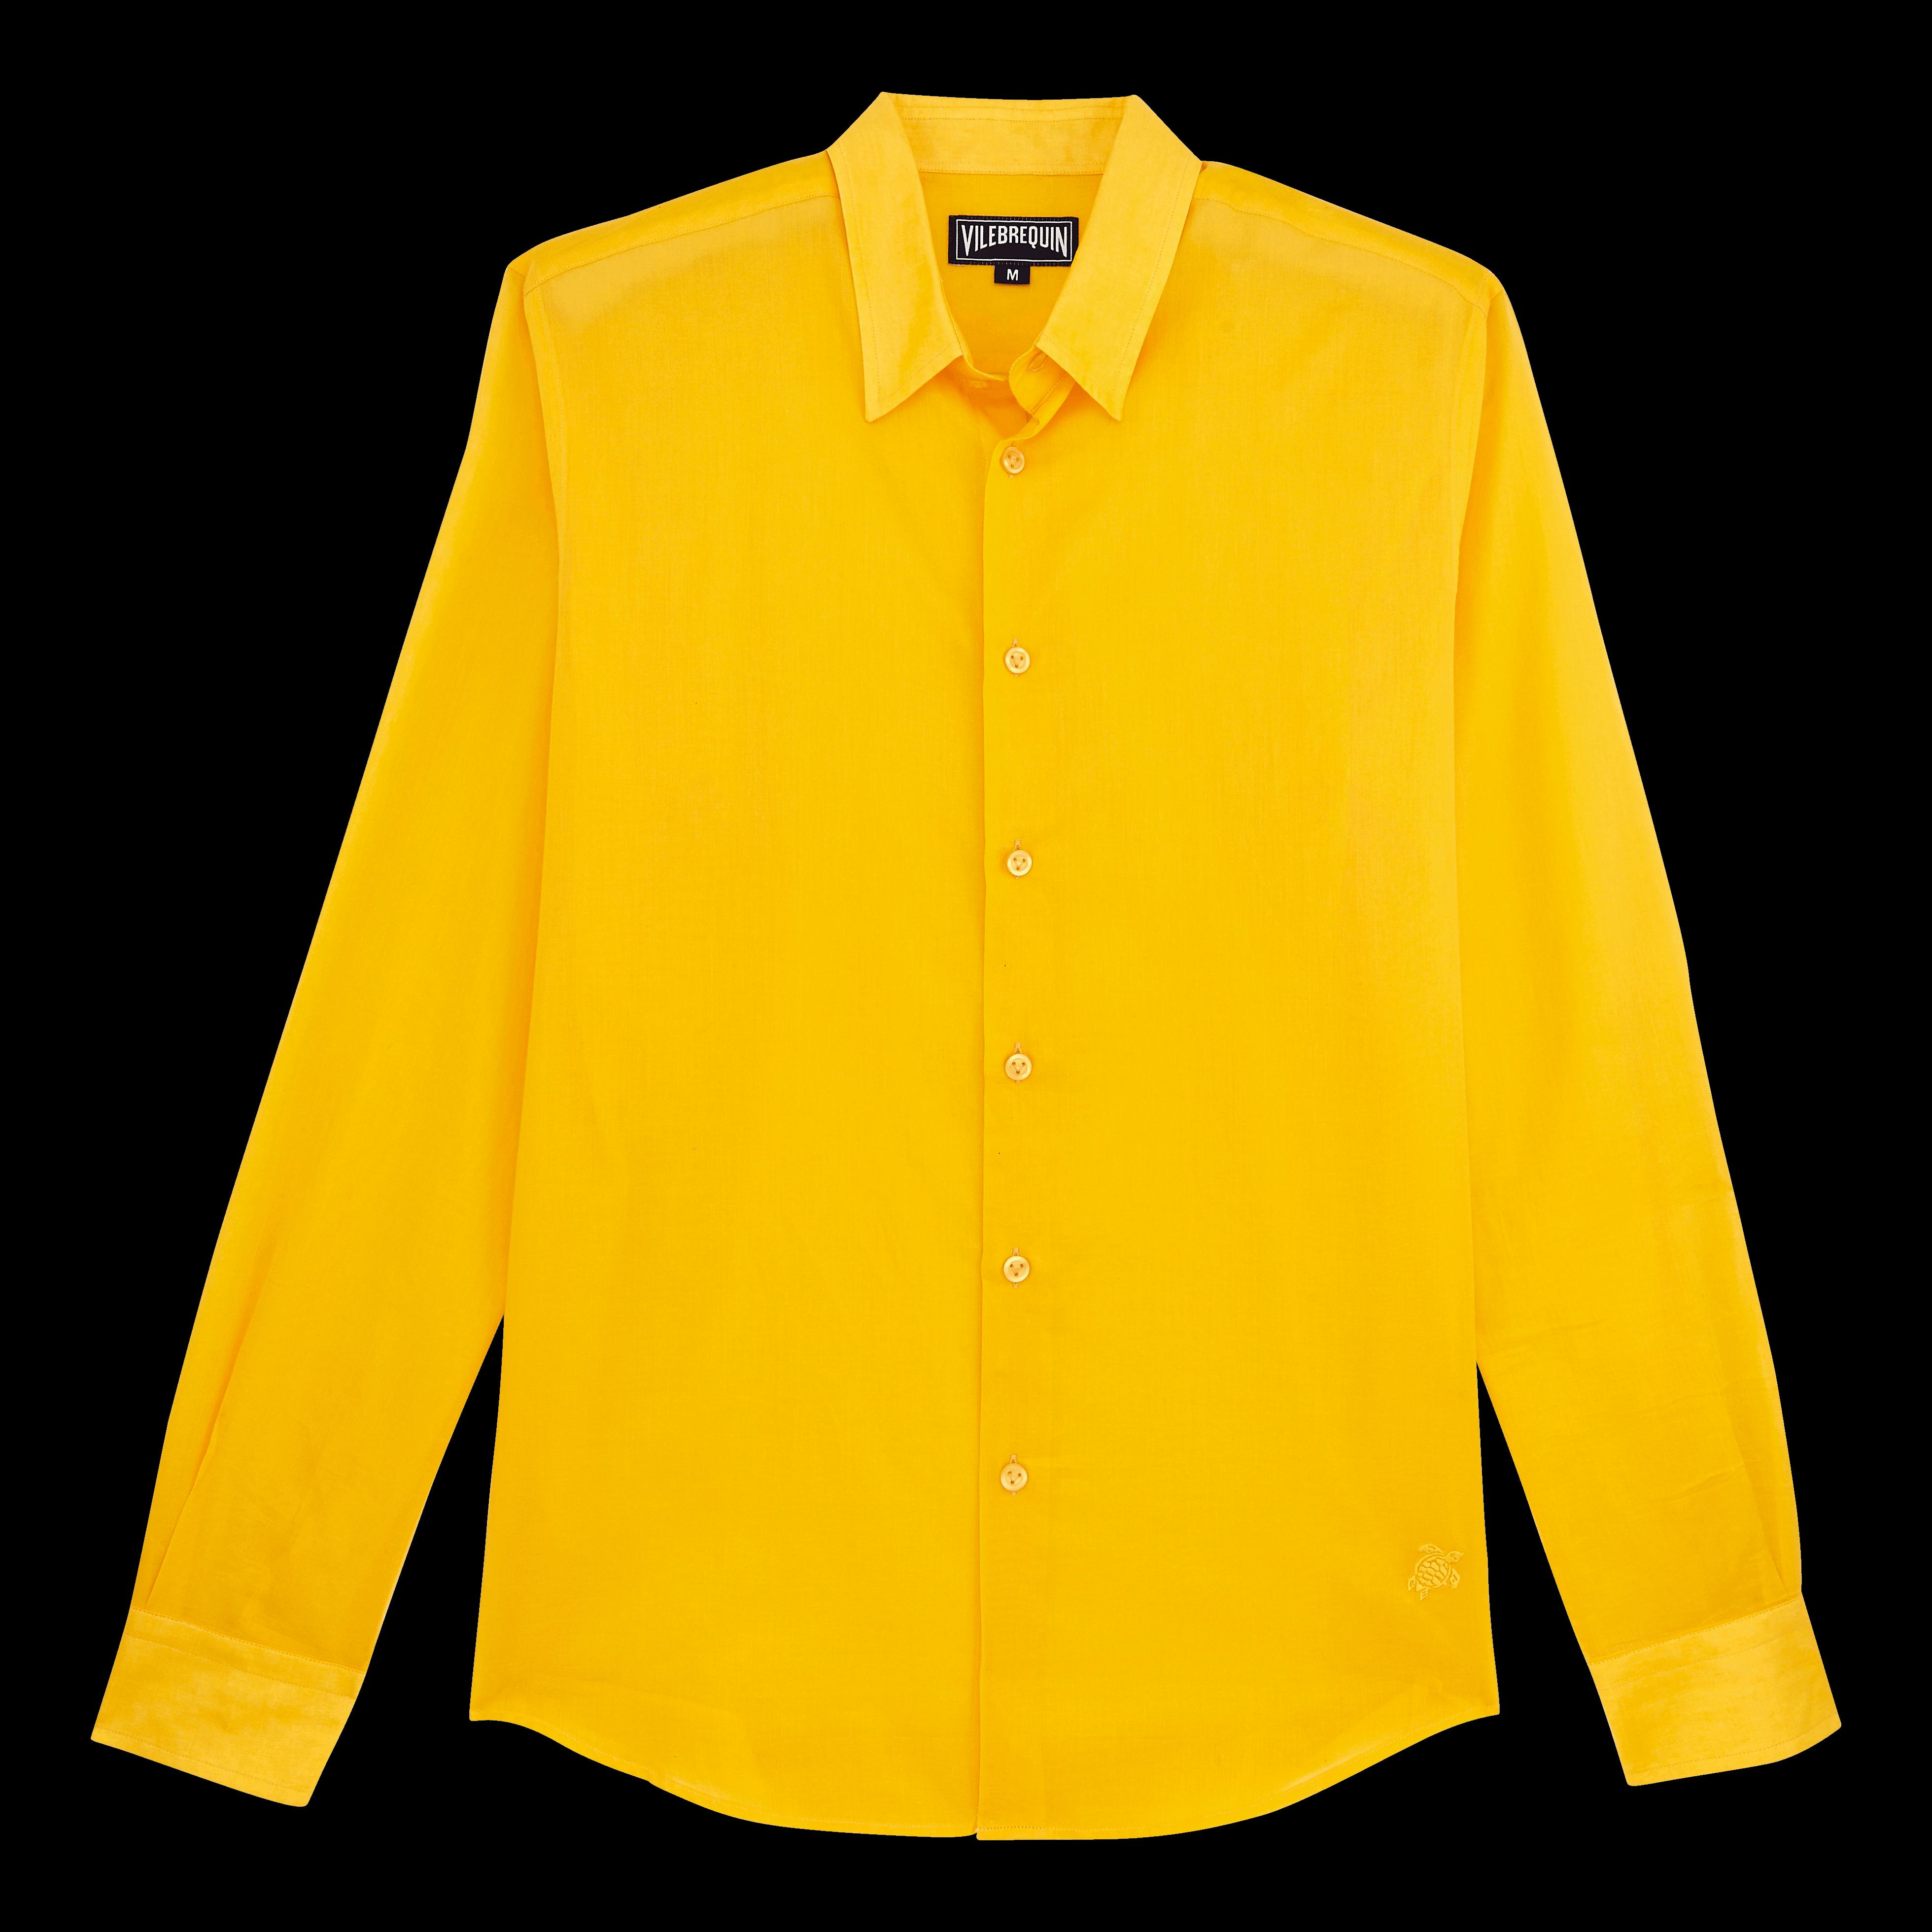 Vilebrequin Pap Unisexe Adulte - Unisex Cotton Shirt Solid - Shirts - Caracal In Orange